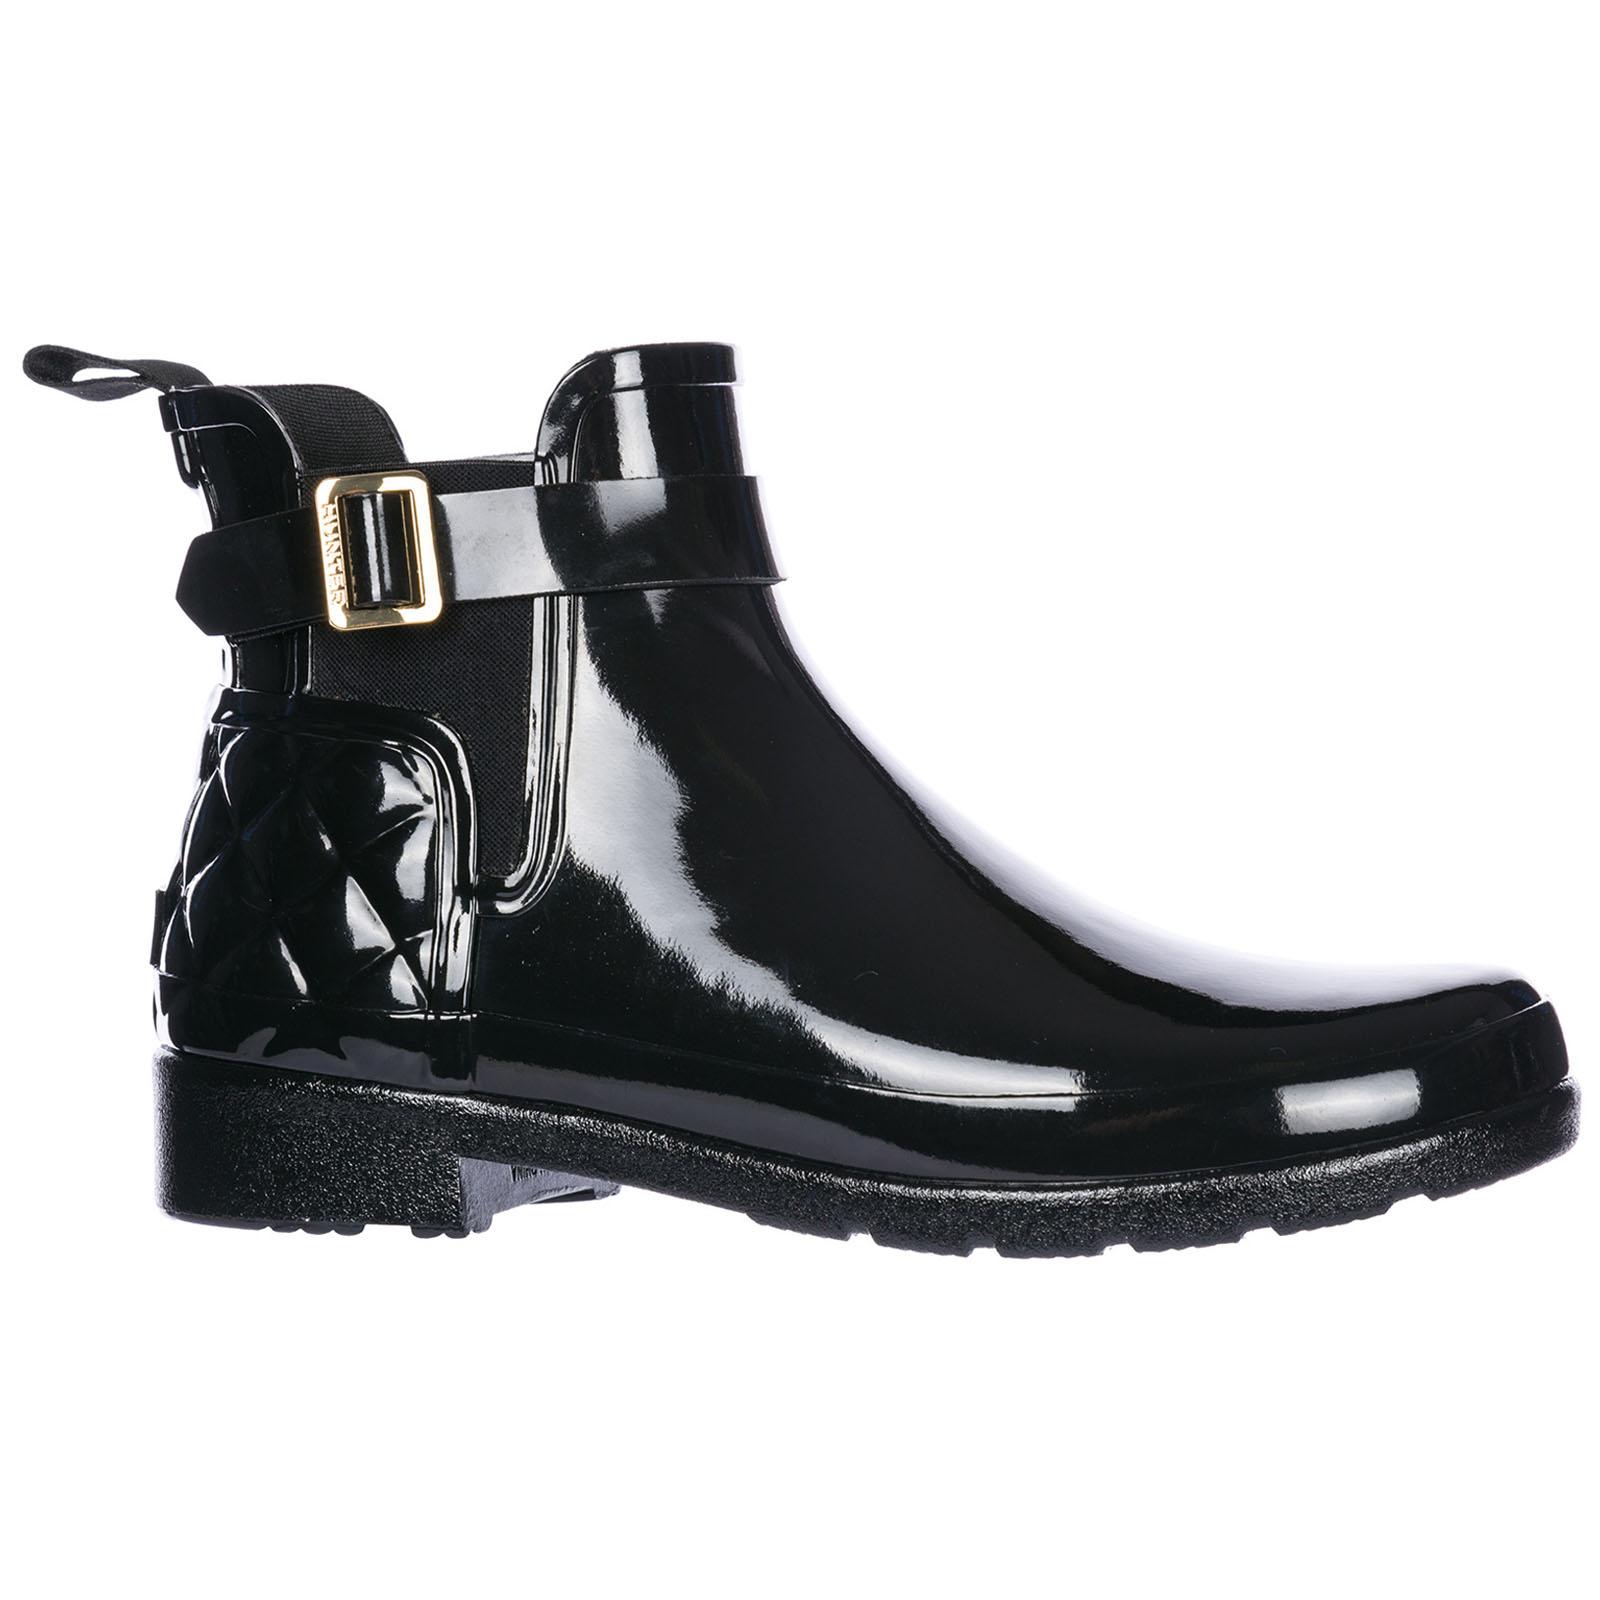 Women's rubber rain boots chelsea